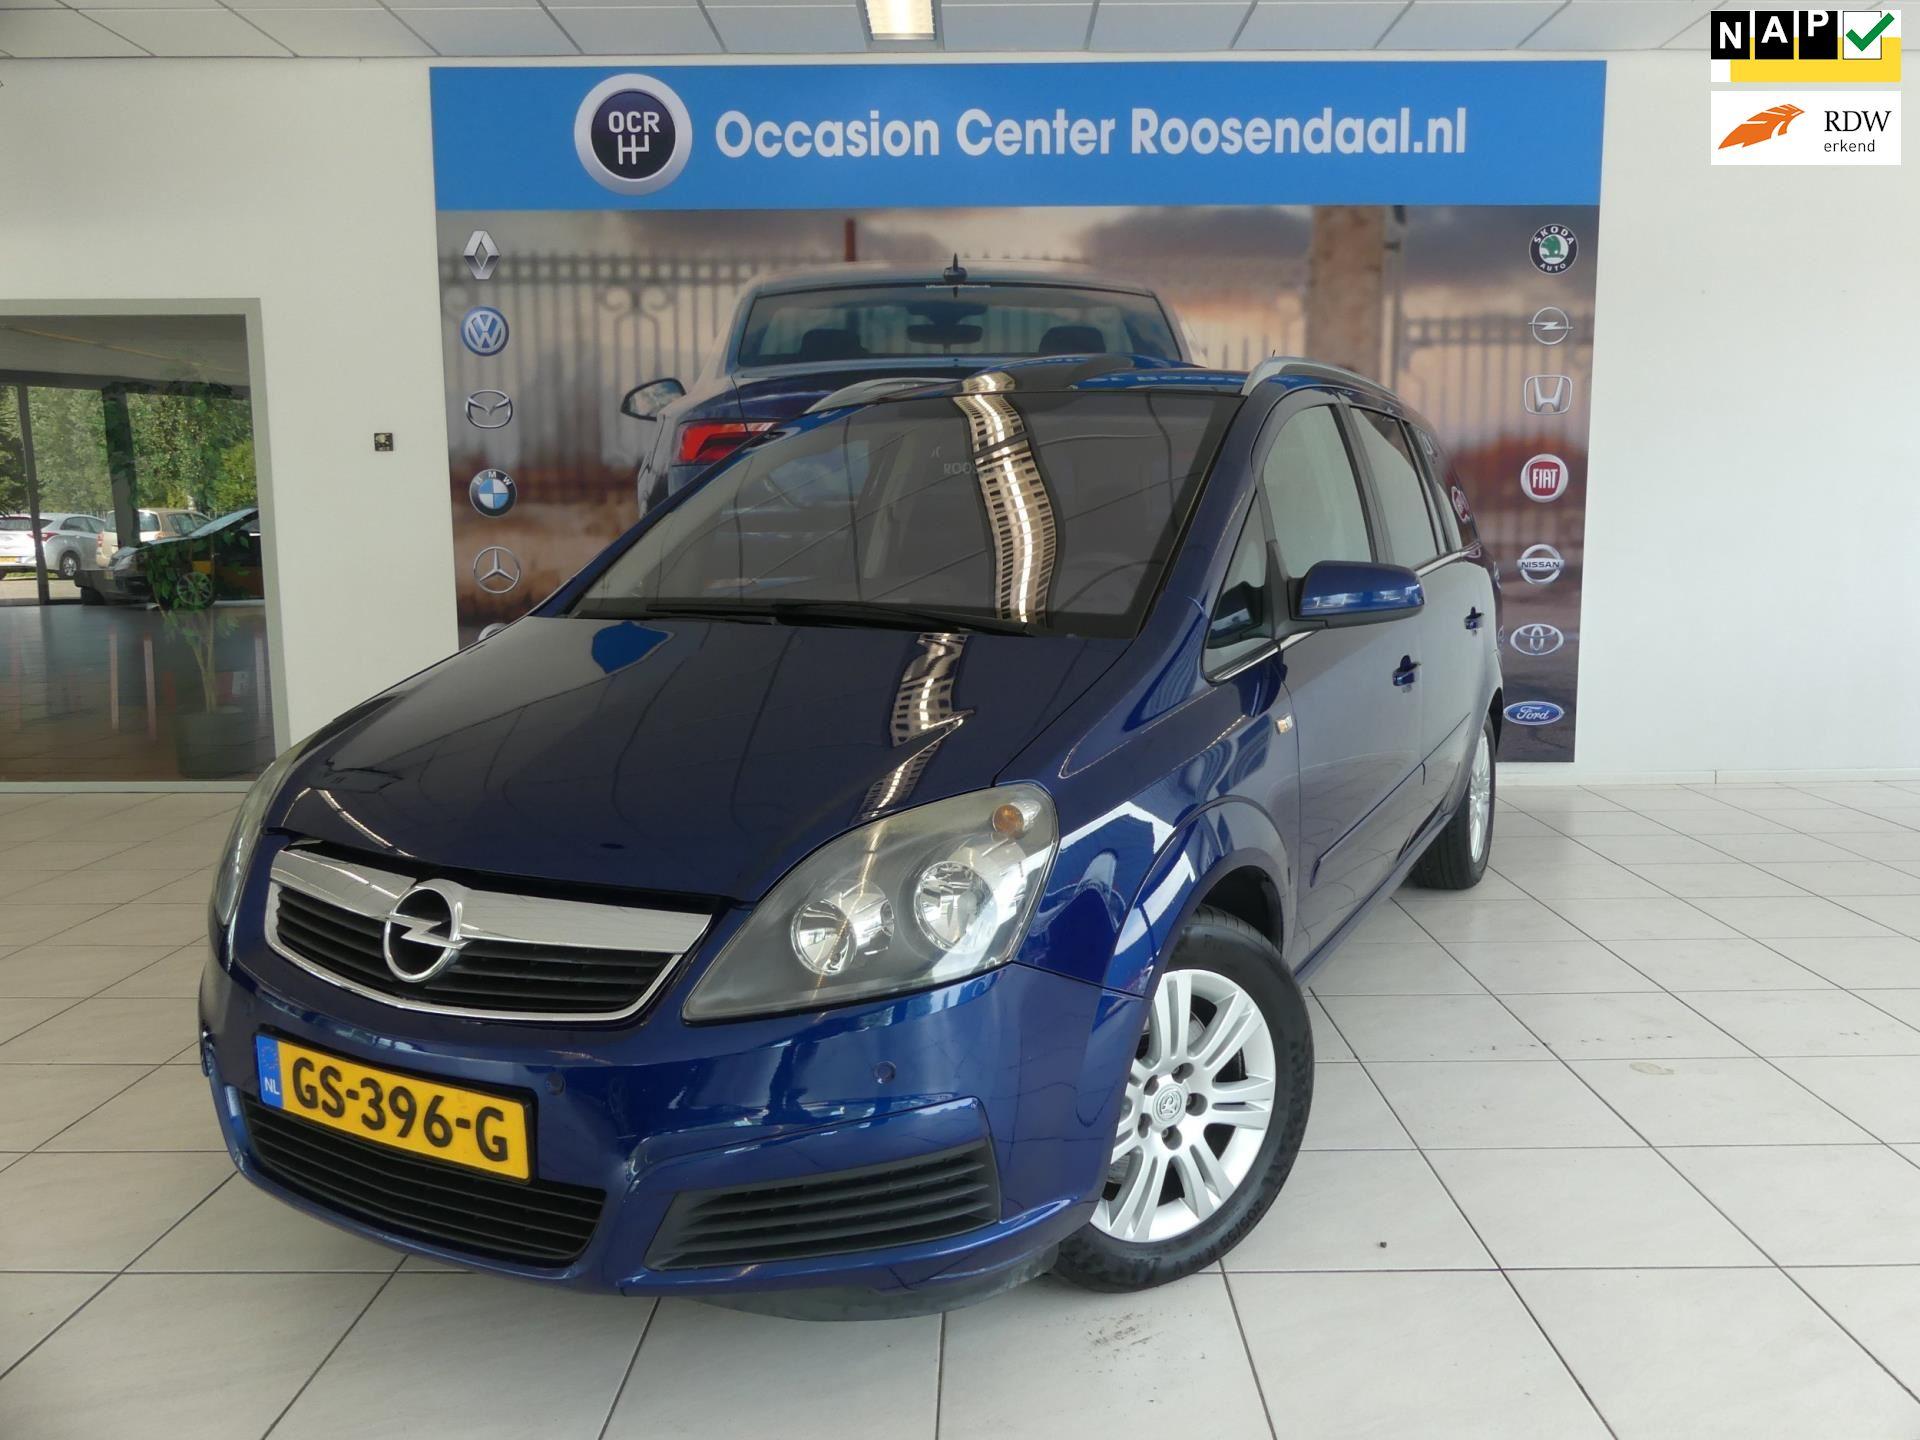 Opel Zafira occasion - Occasion Center Roosendaal